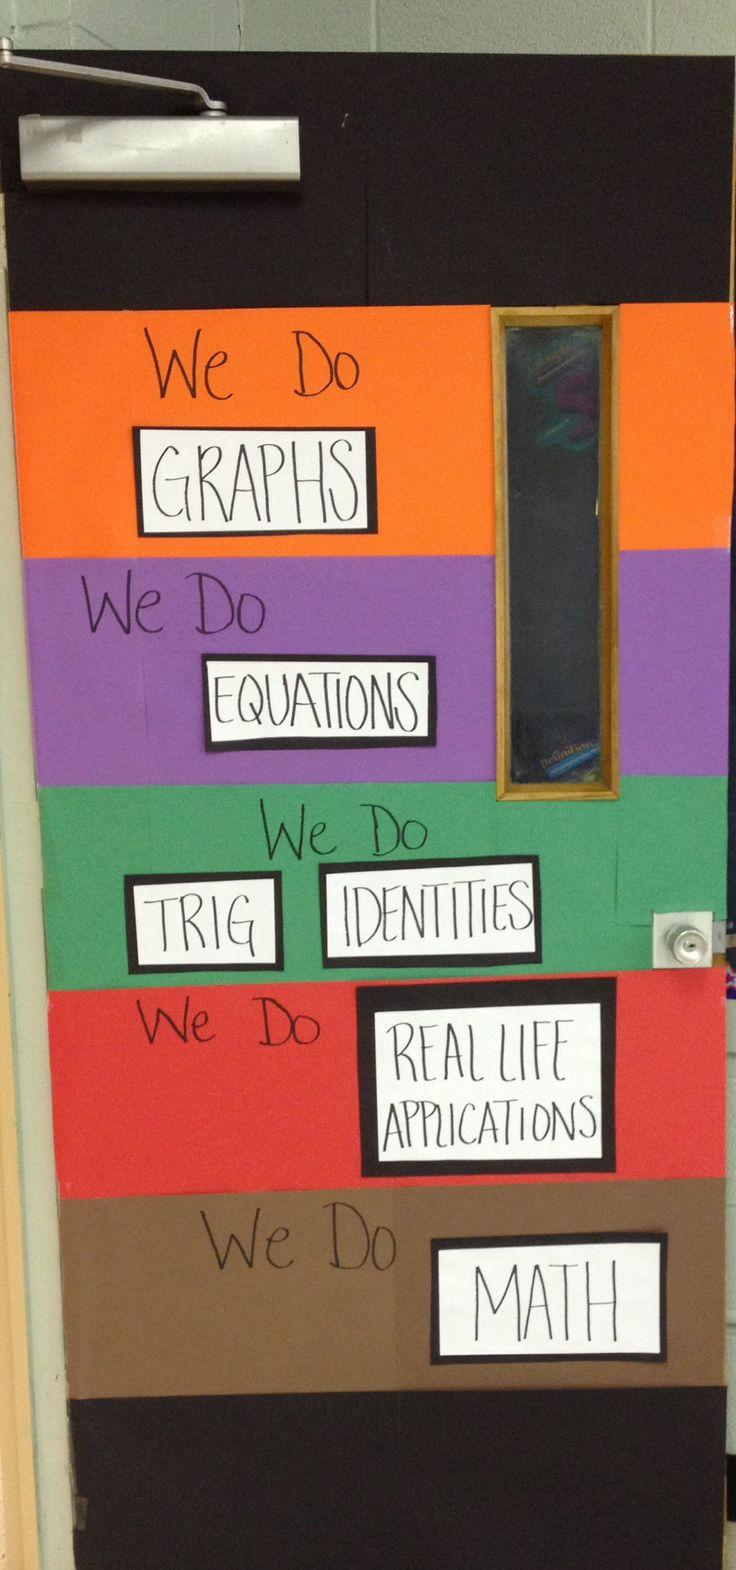 Math door decorations